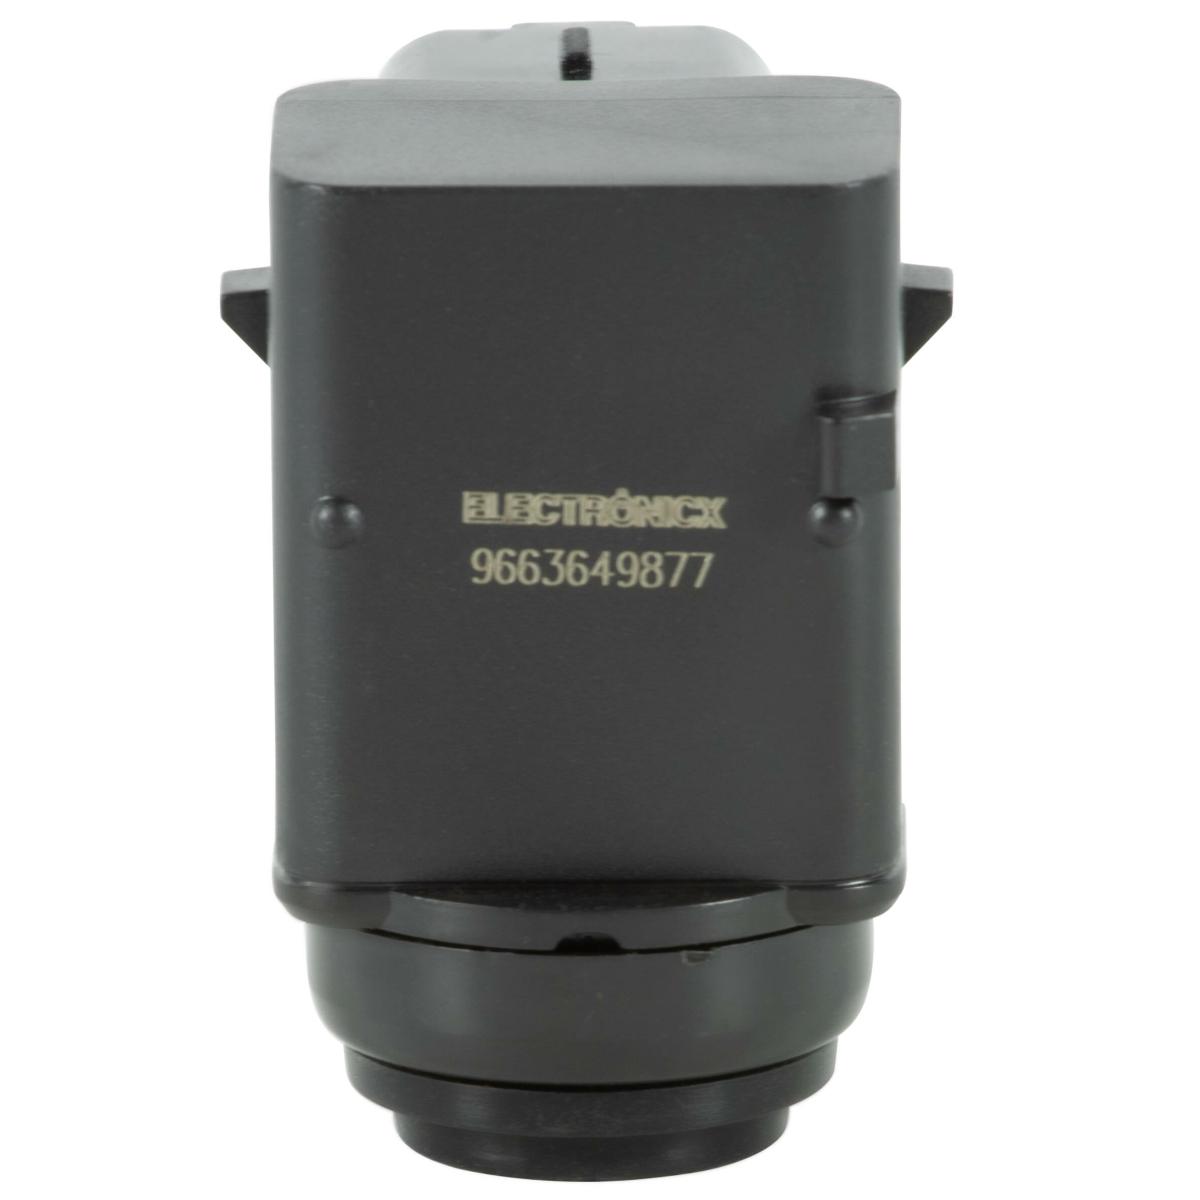 Park sensor PSA9663649877 for Peugeot, Citroen, Renault PDC Parktronic